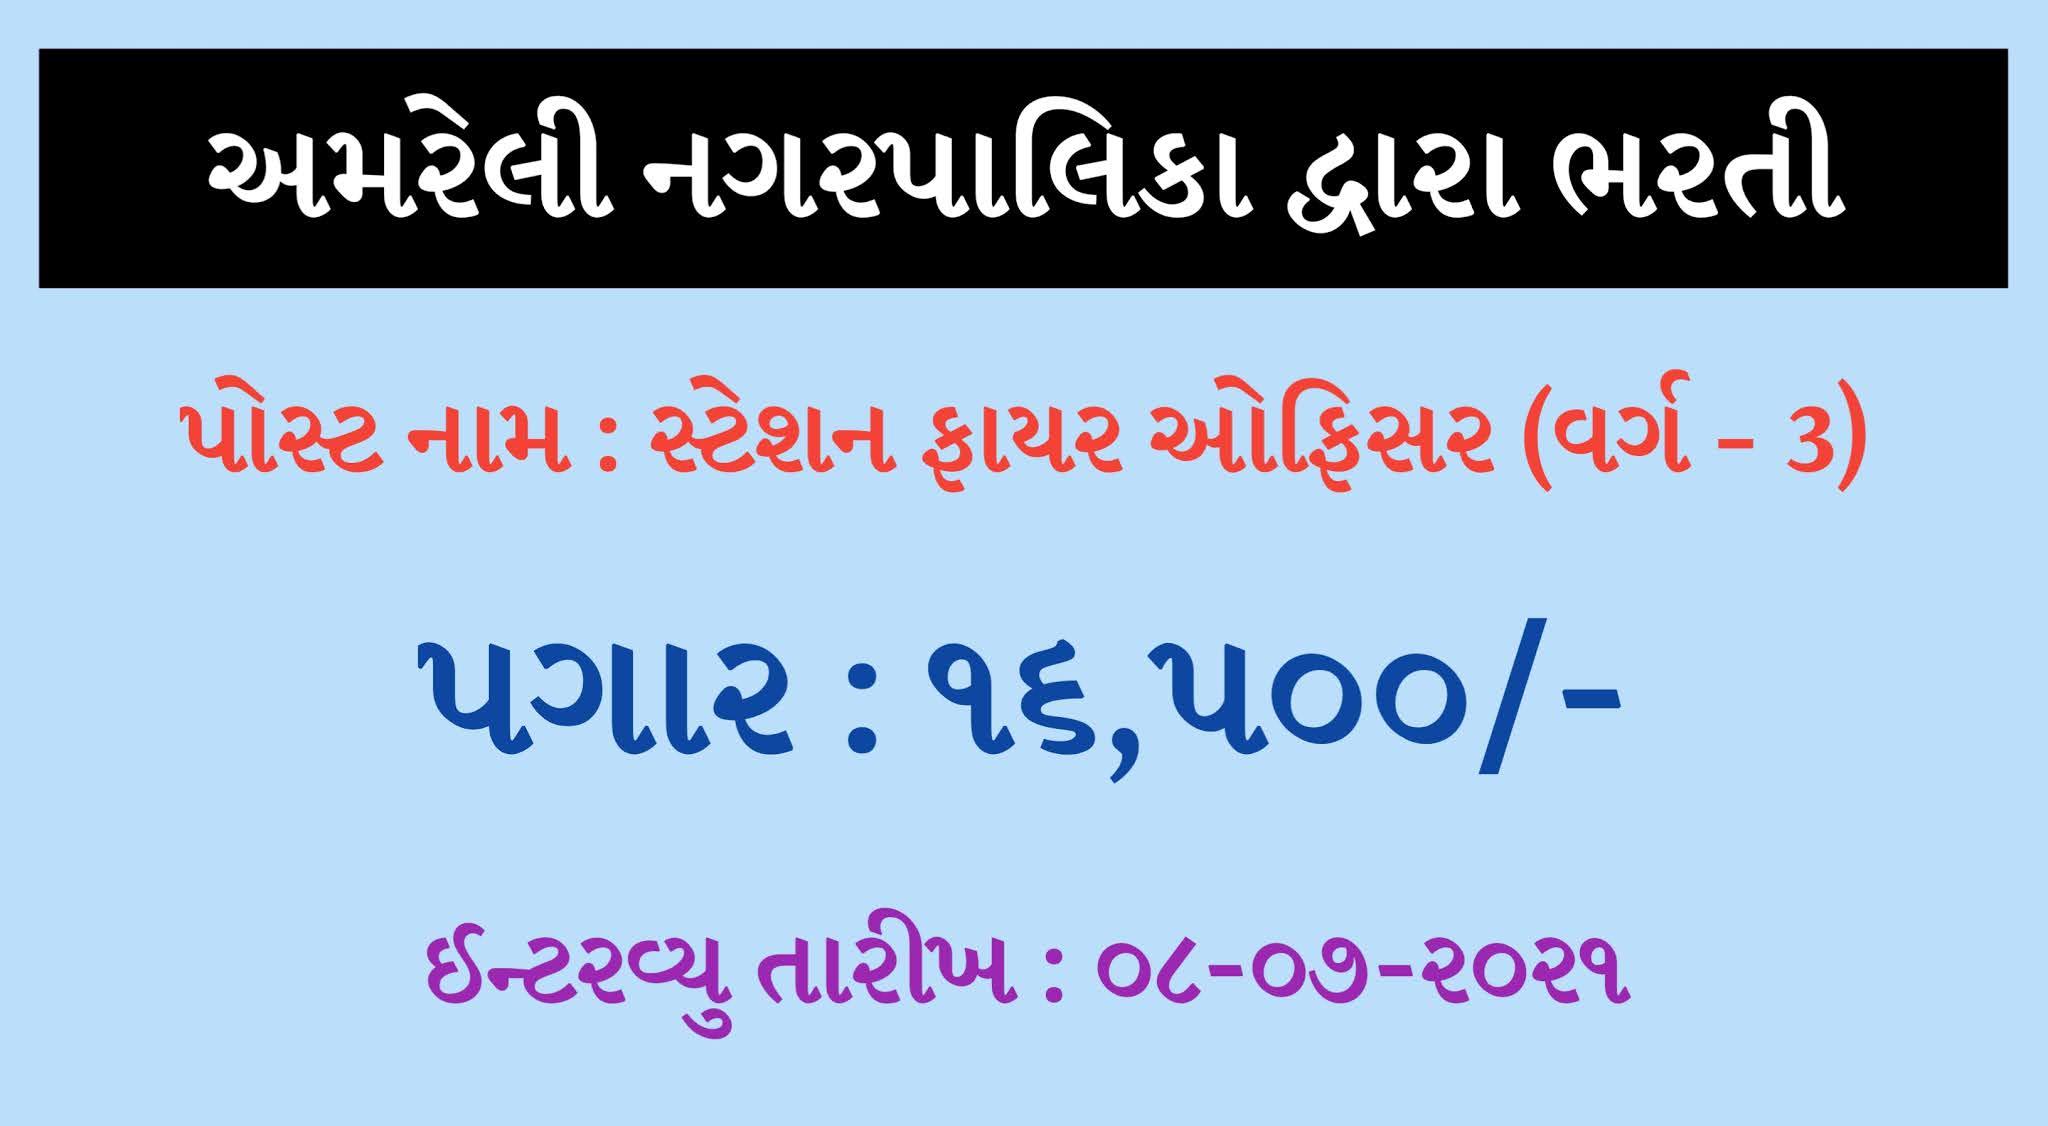 Amreli Nagarpalika Recruitment 2021, Station Fire Officer Recruitment 2021,Amreli Nagarpalika Recruitment Fire Officer post 2021